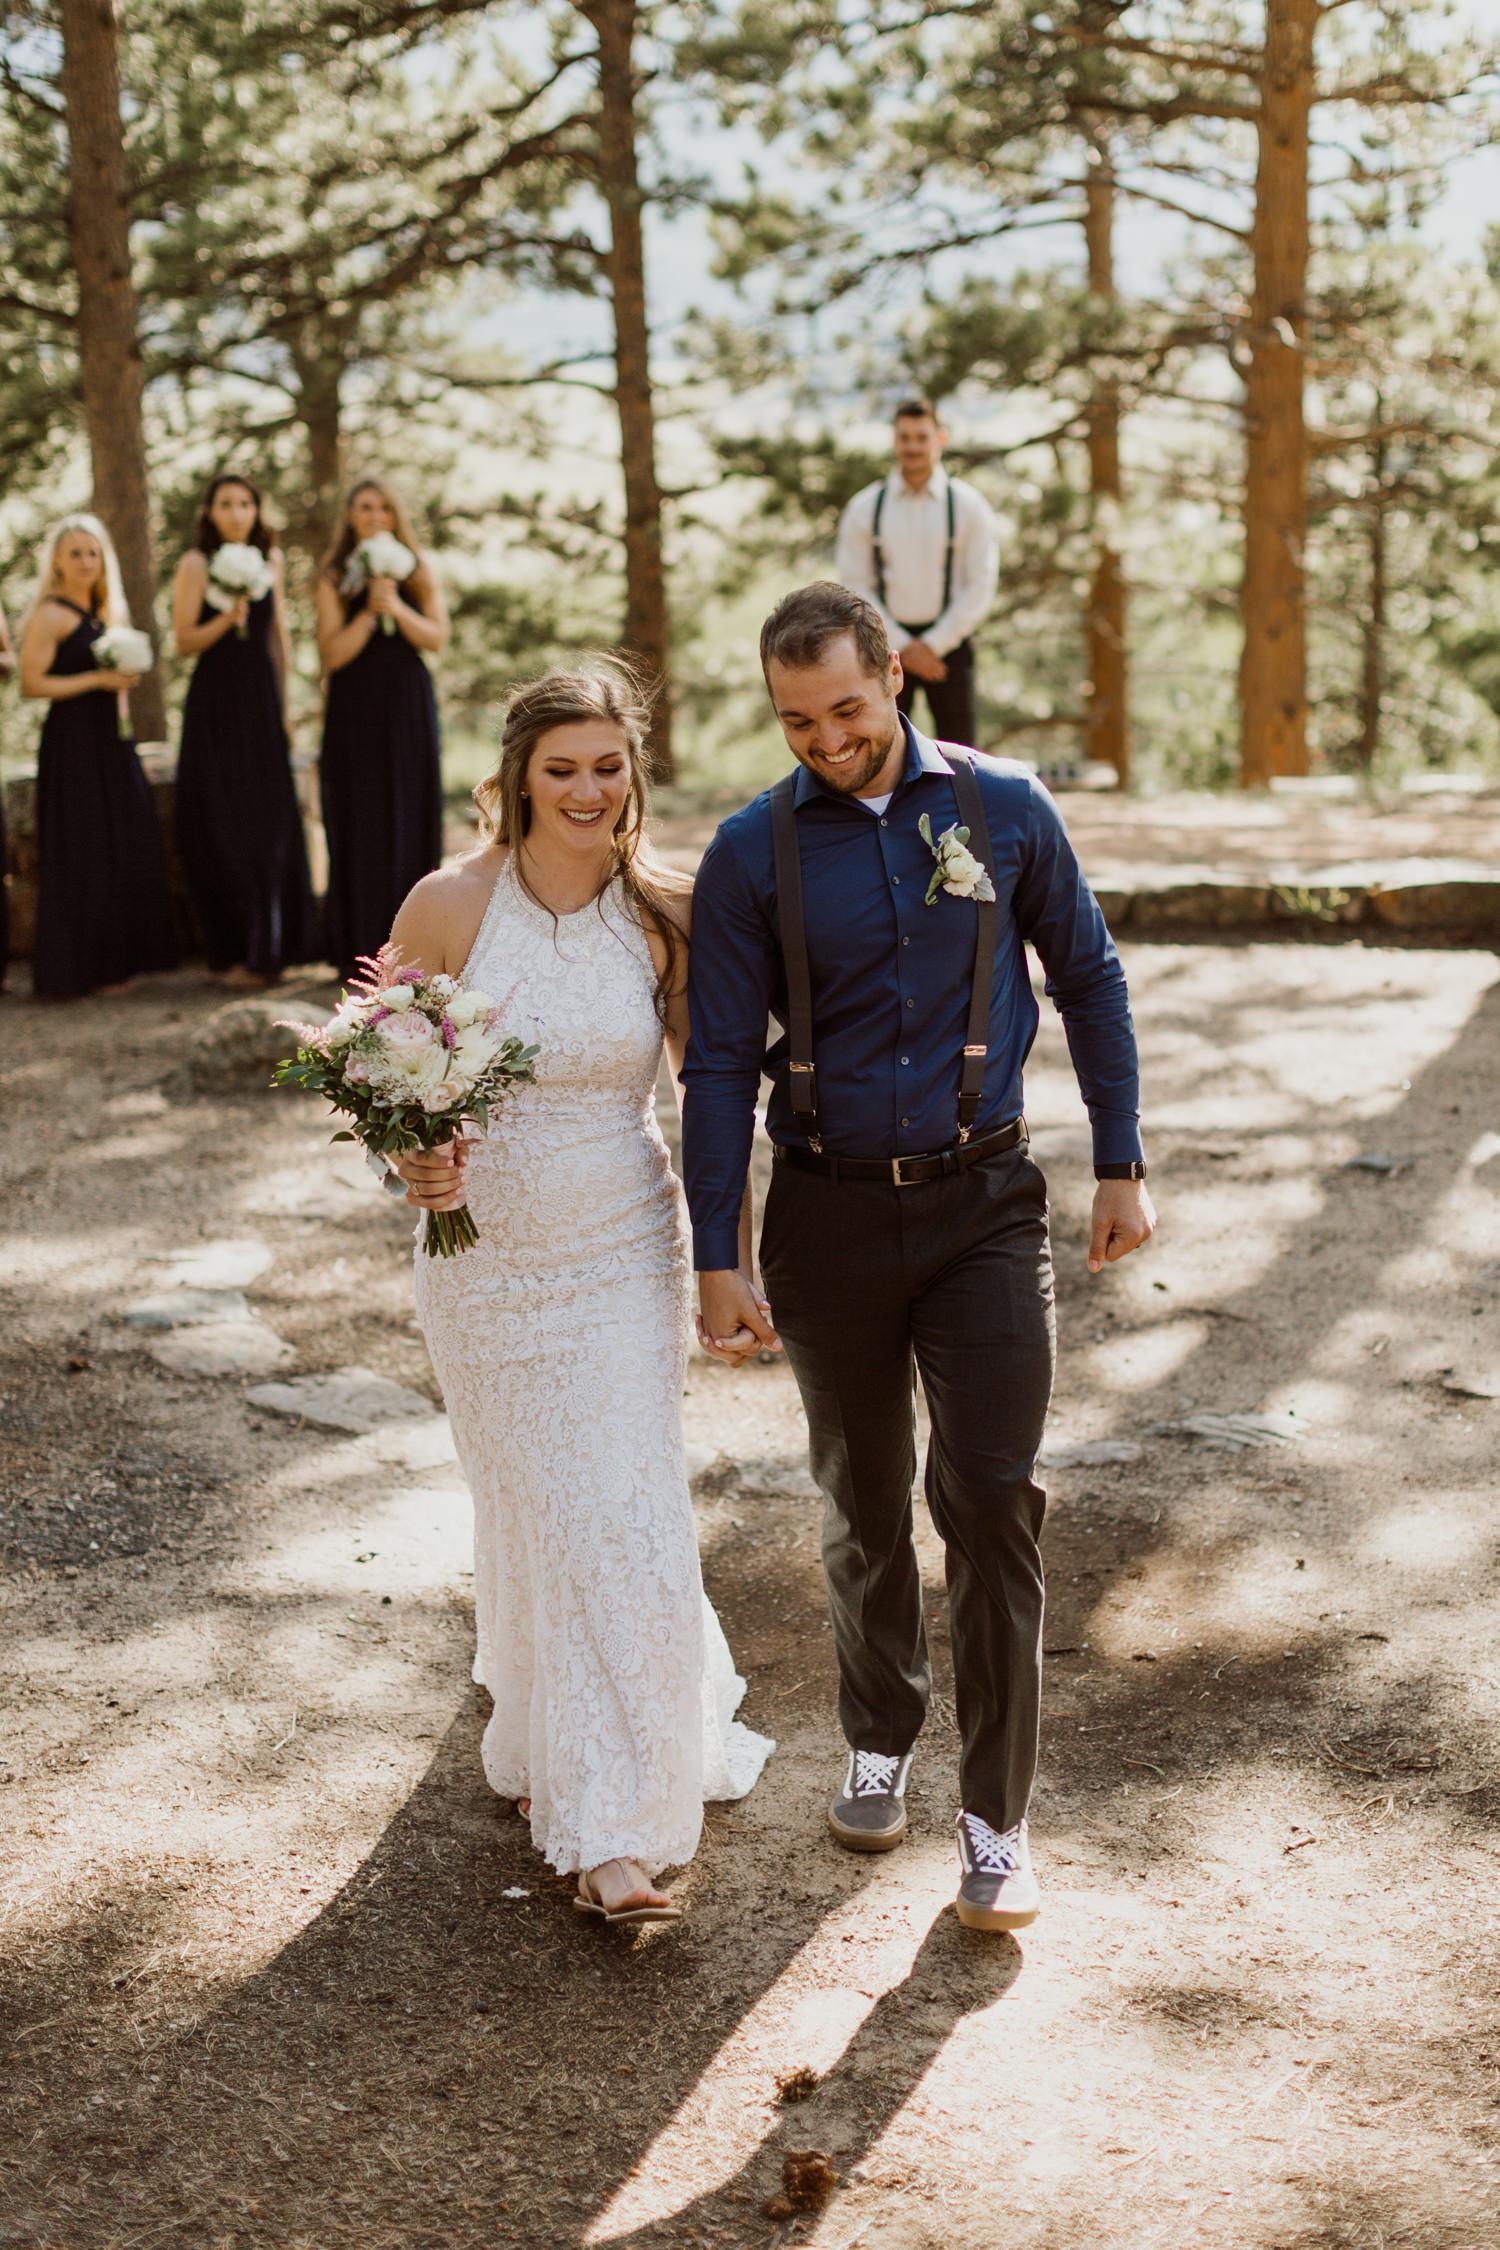 rocky-mountain-national-park-wedding-28.jpg